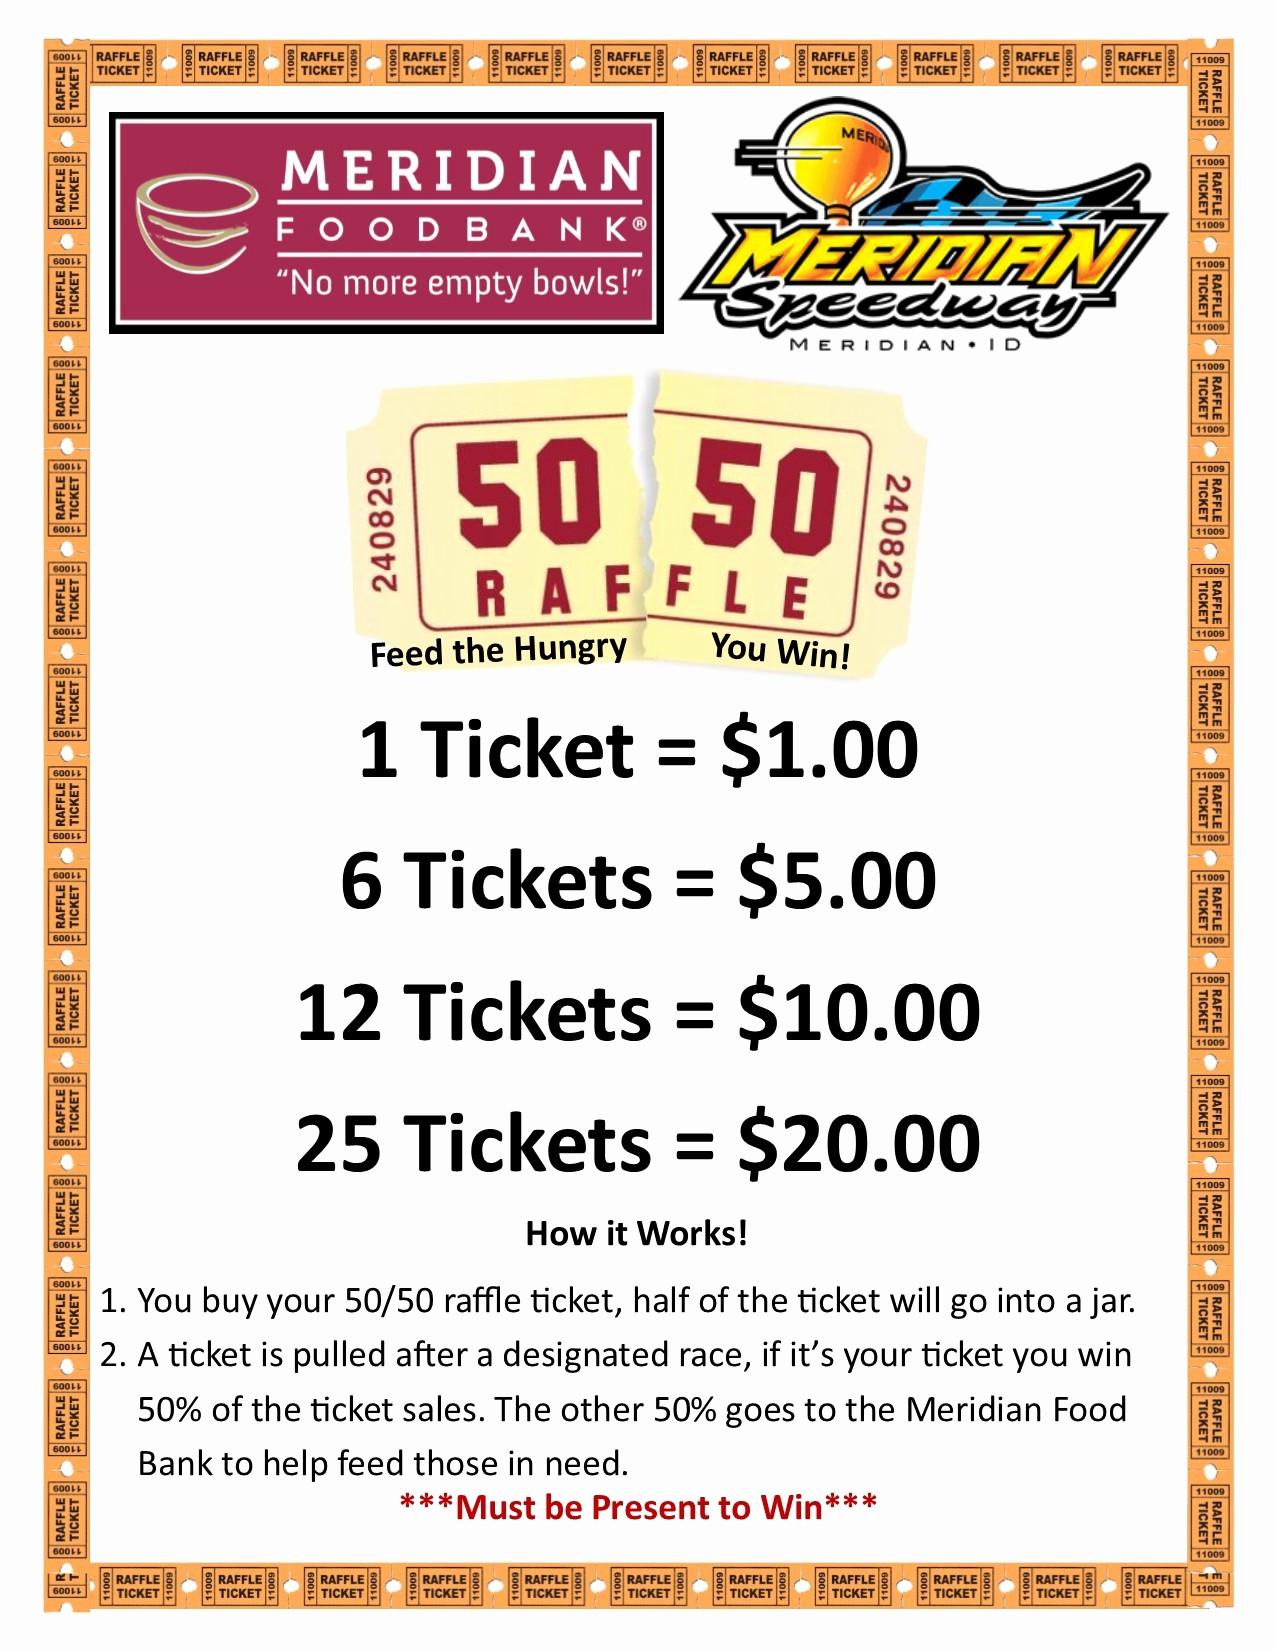 50 50 Raffle Ticket Template New Speedway 50 50 – Meridian Food Bank